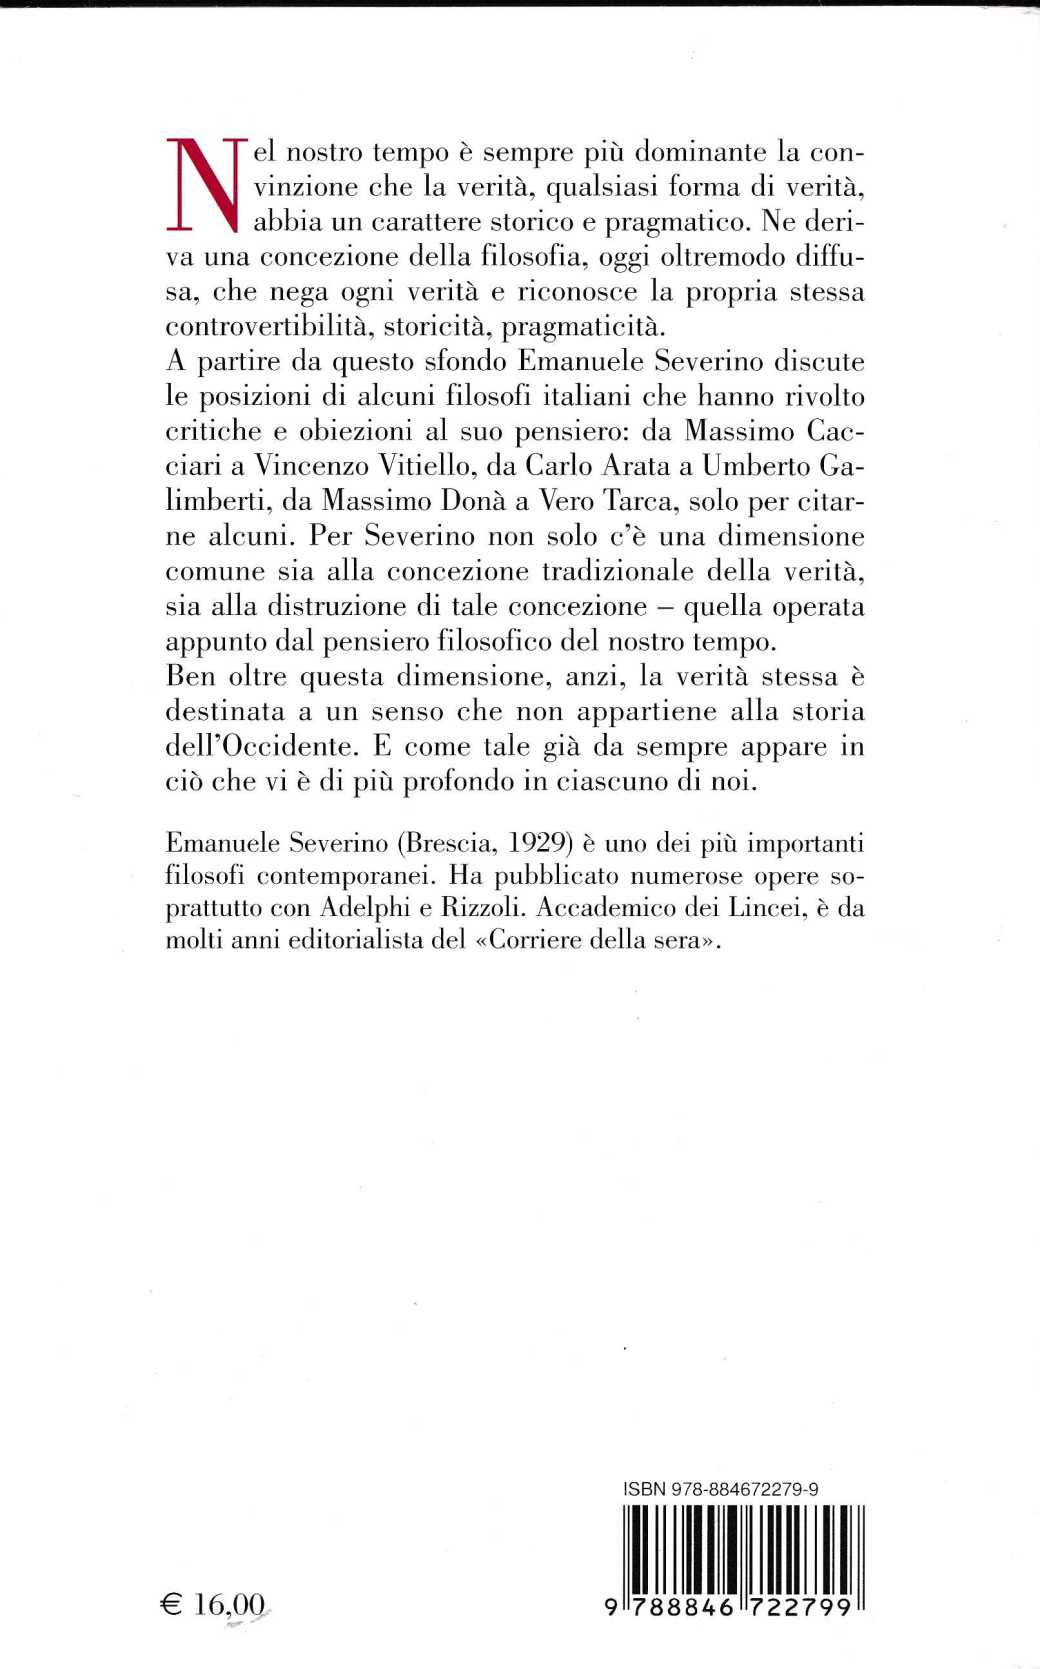 libri emanuele sevrino1925